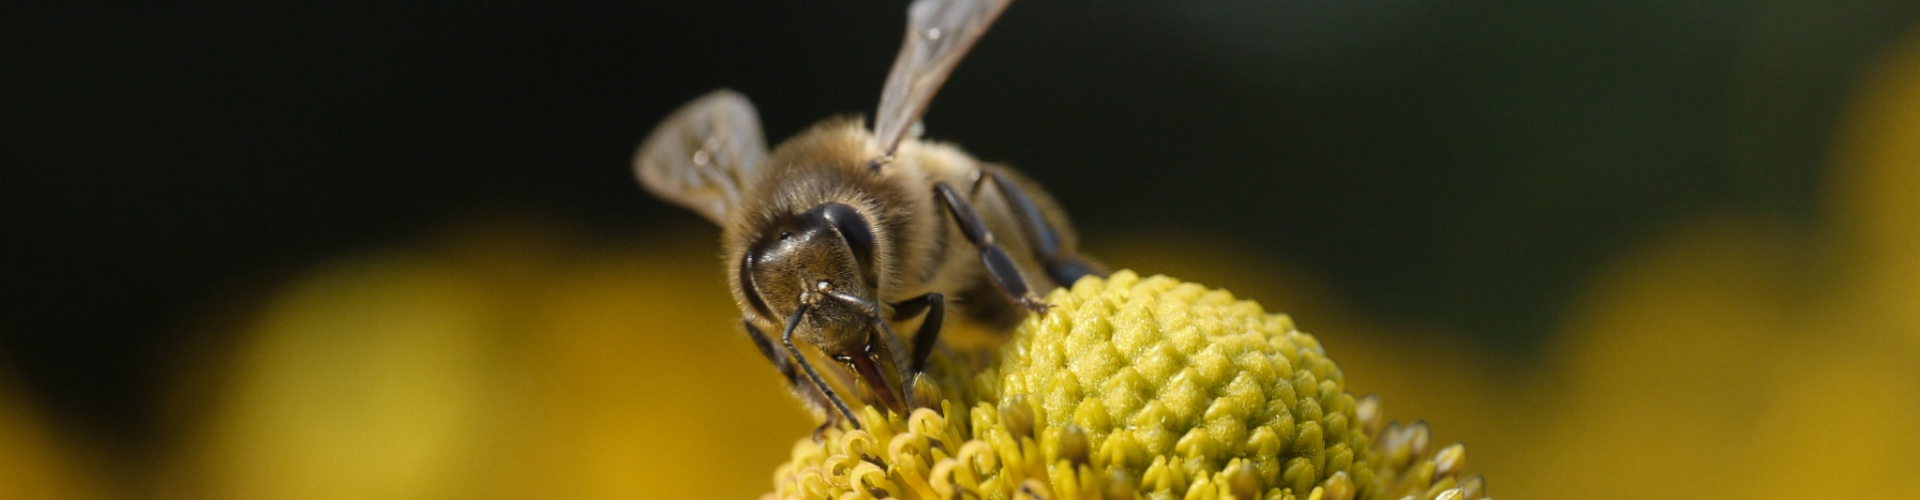 honingbij nederlandse bloem